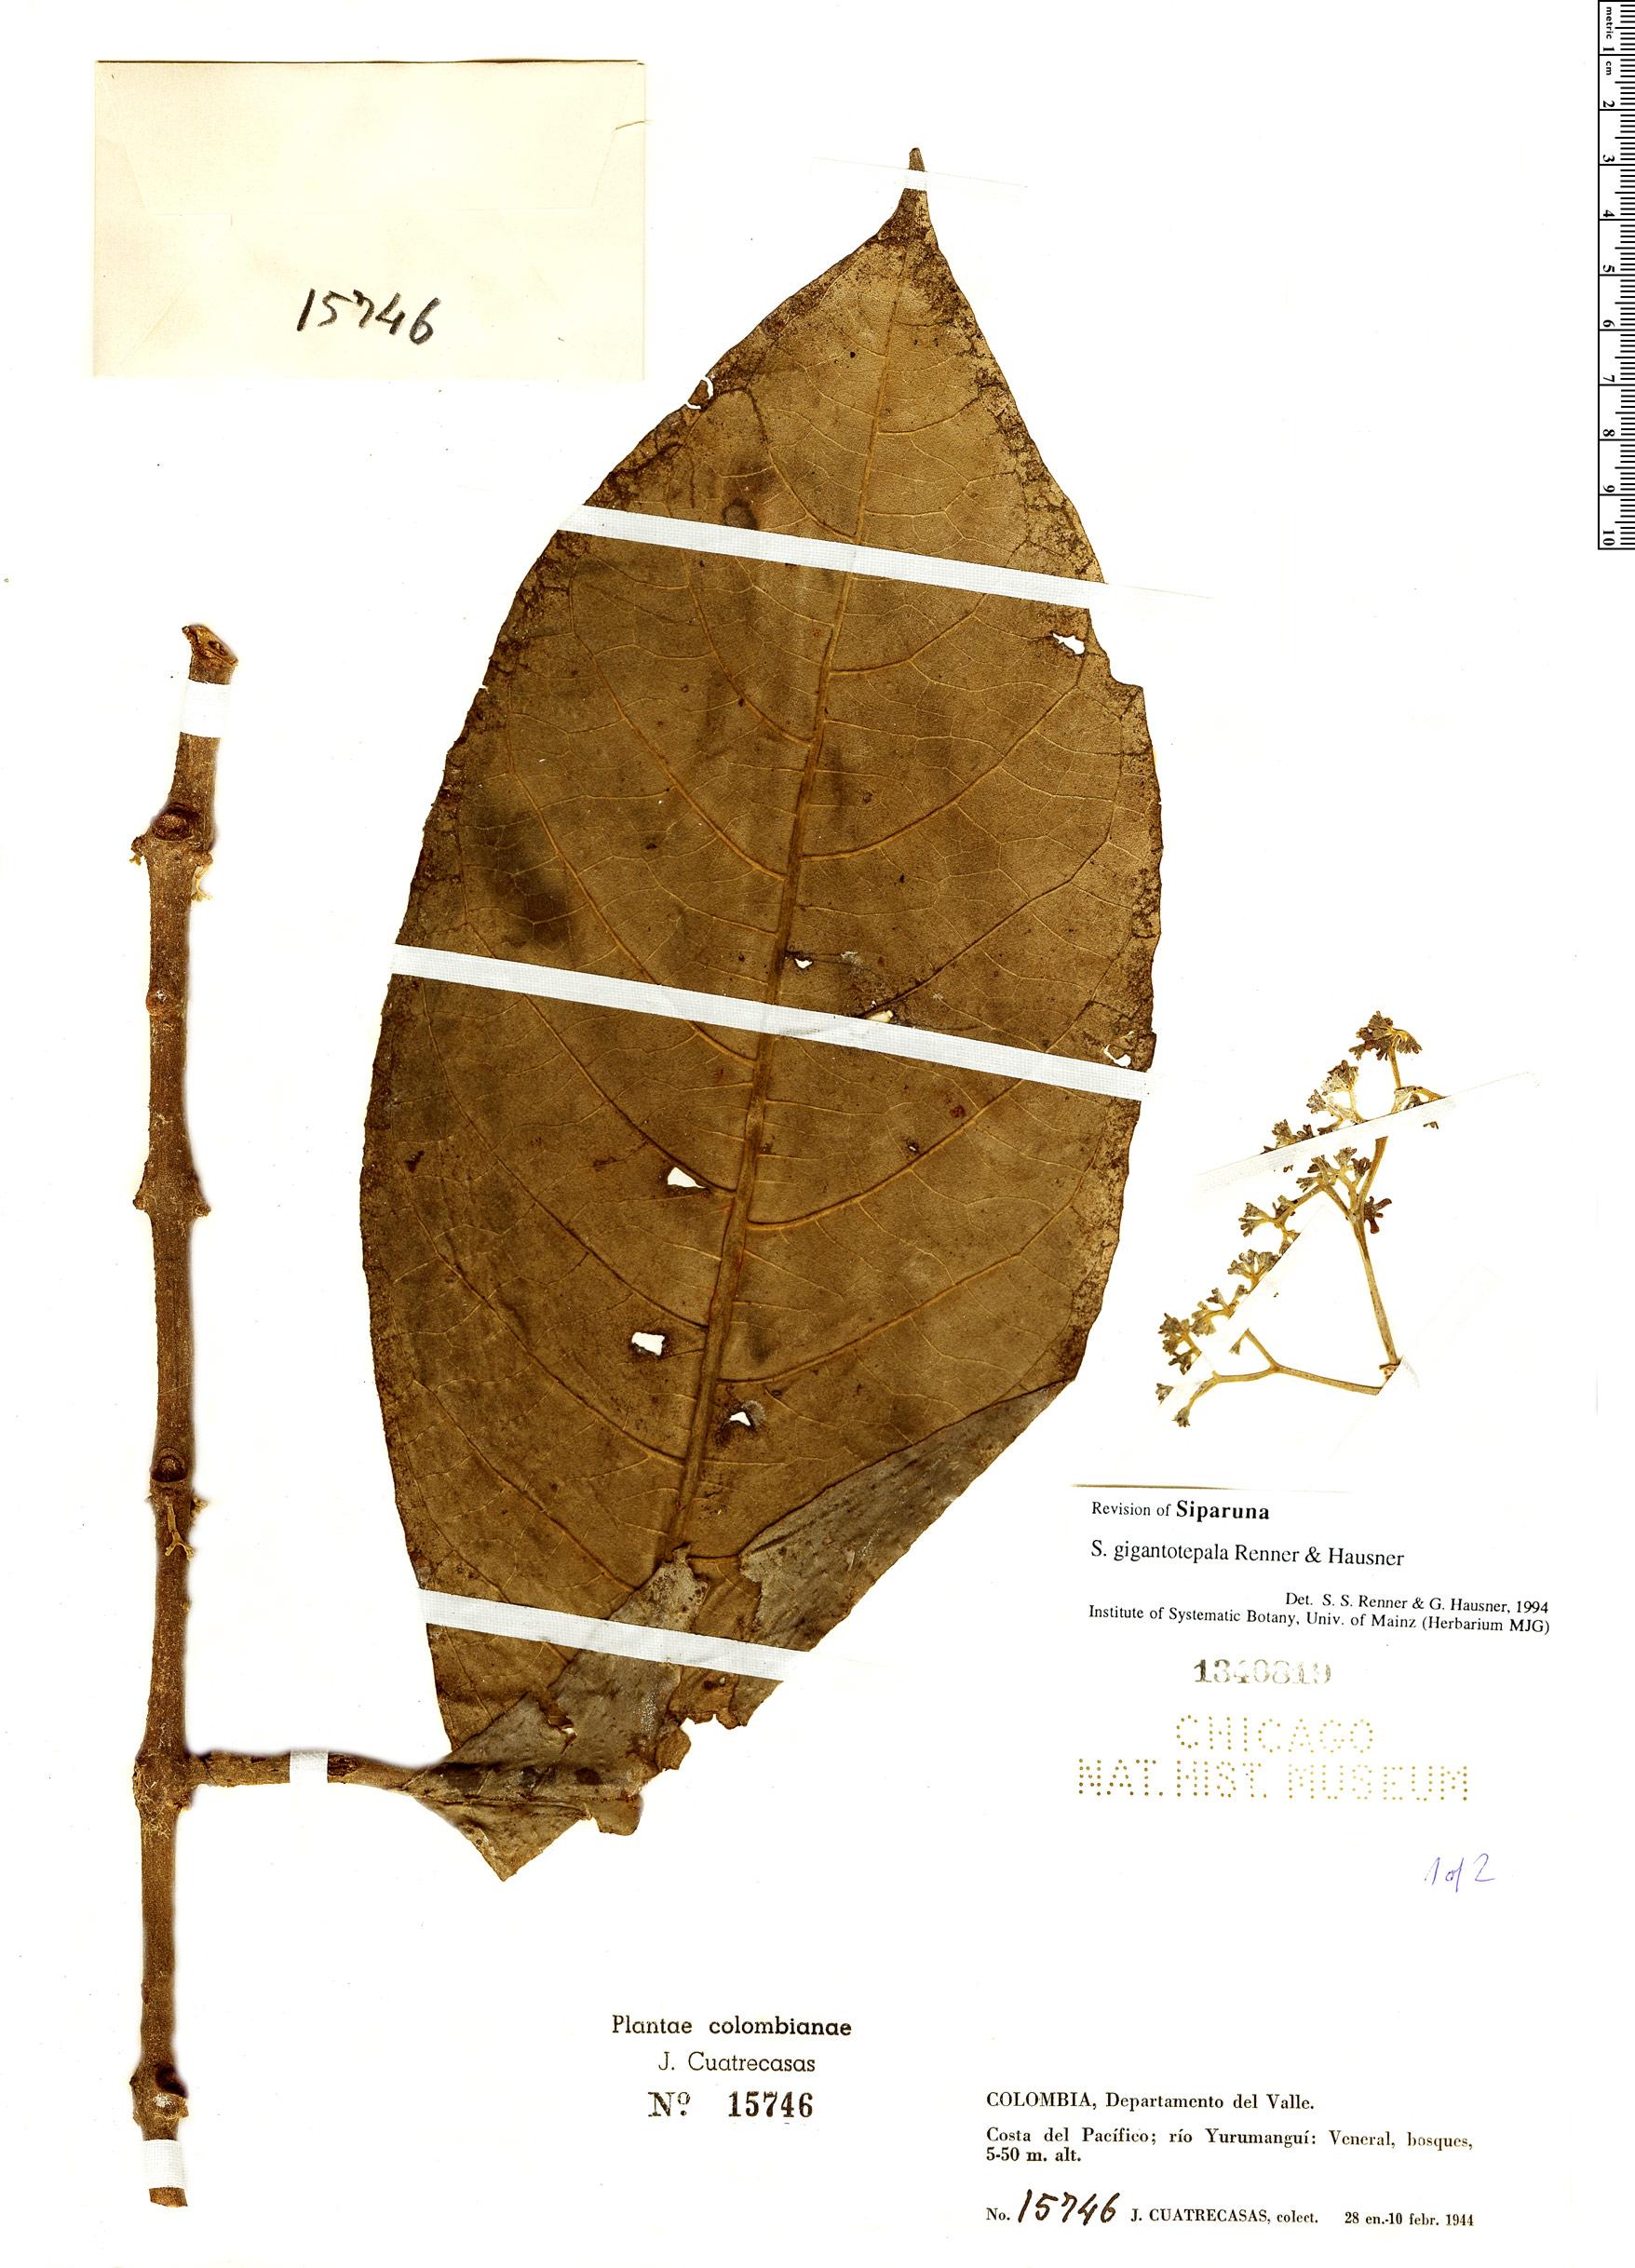 Specimen: Siparuna gigantotepala